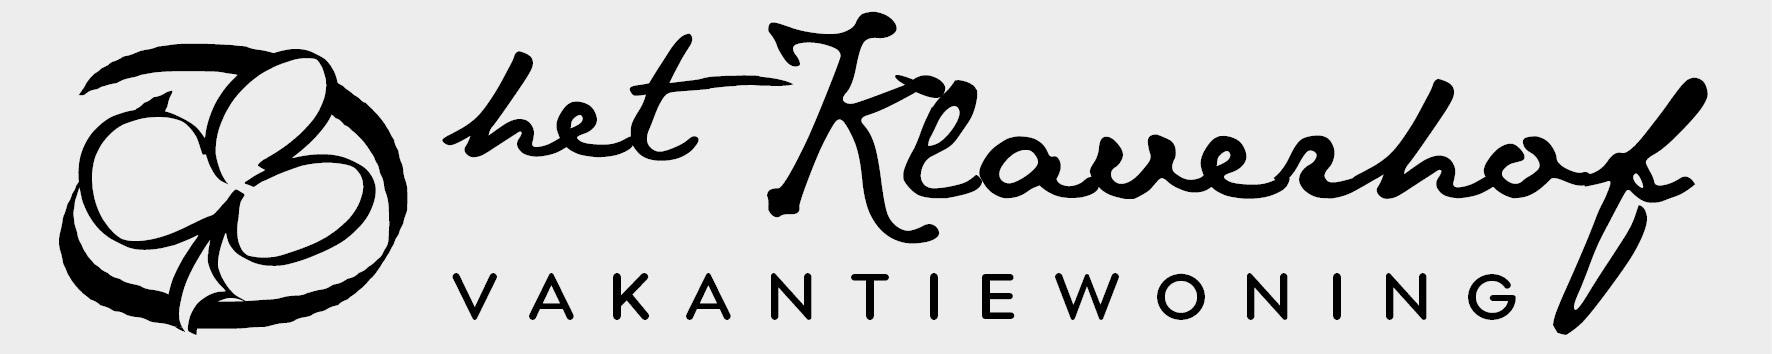 logo-klaverhof-header